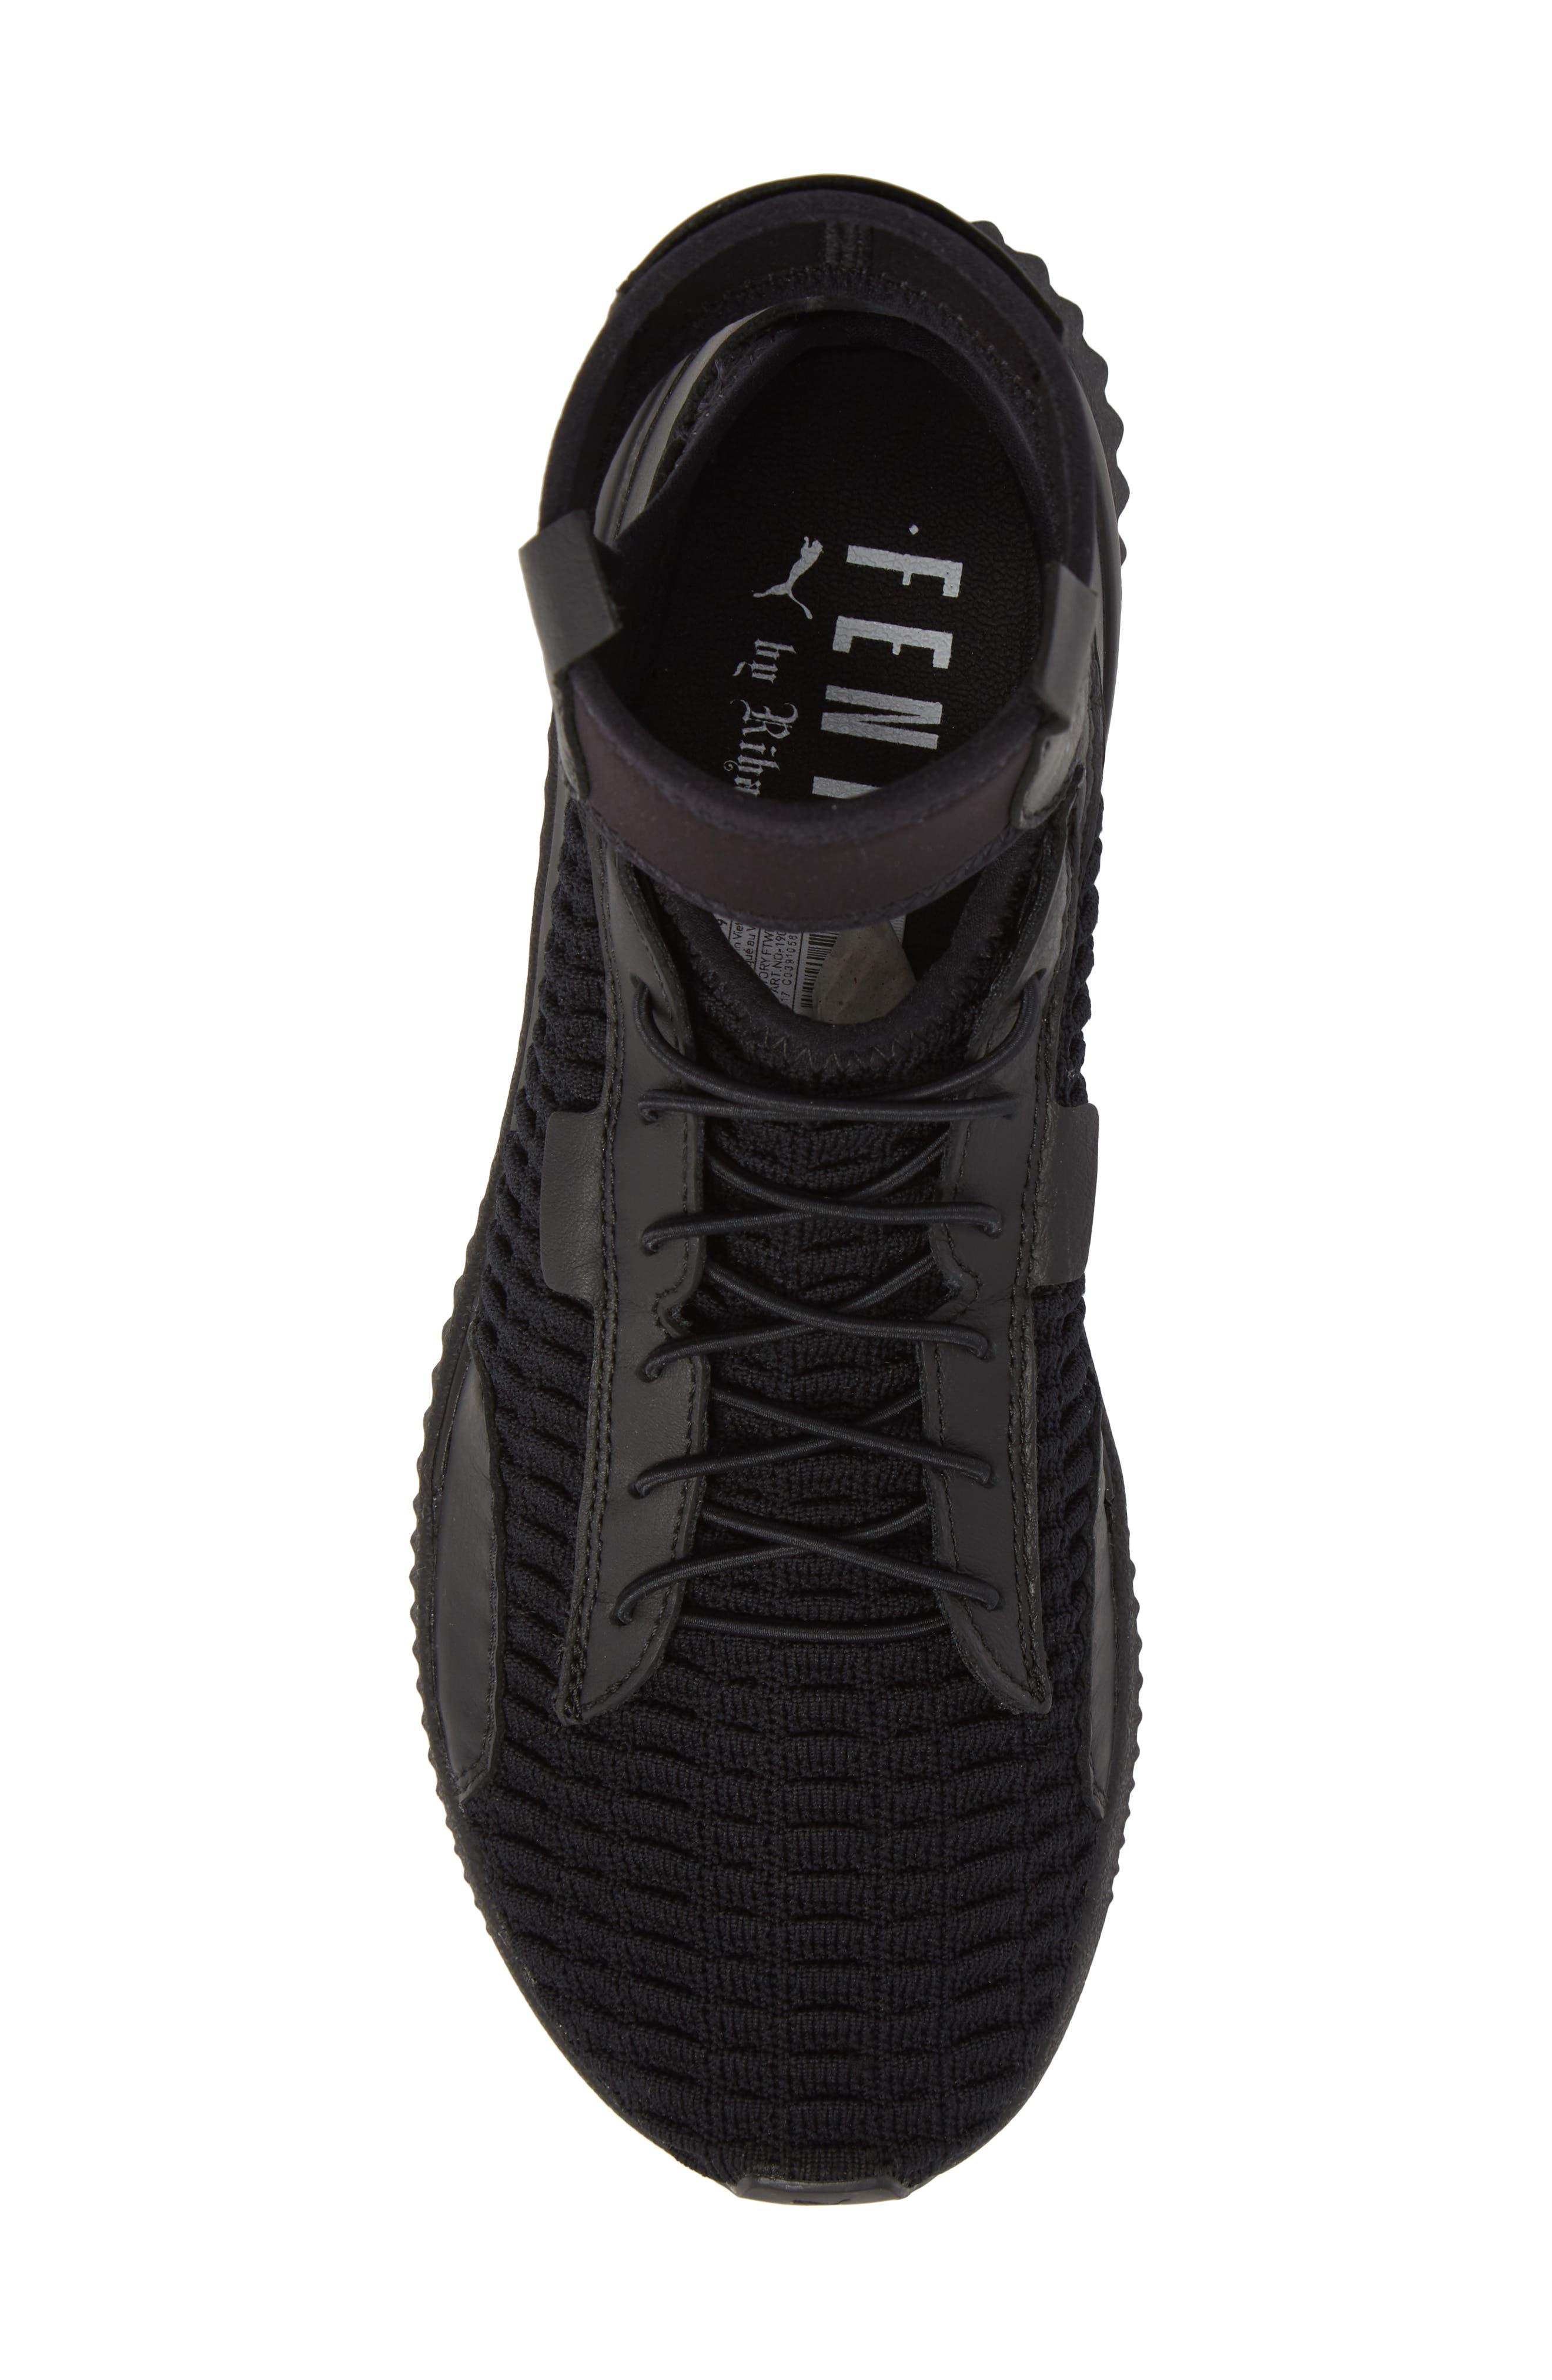 FENTY PUMA by Rihanna High Top Sneaker,                             Alternate thumbnail 5, color,                             001